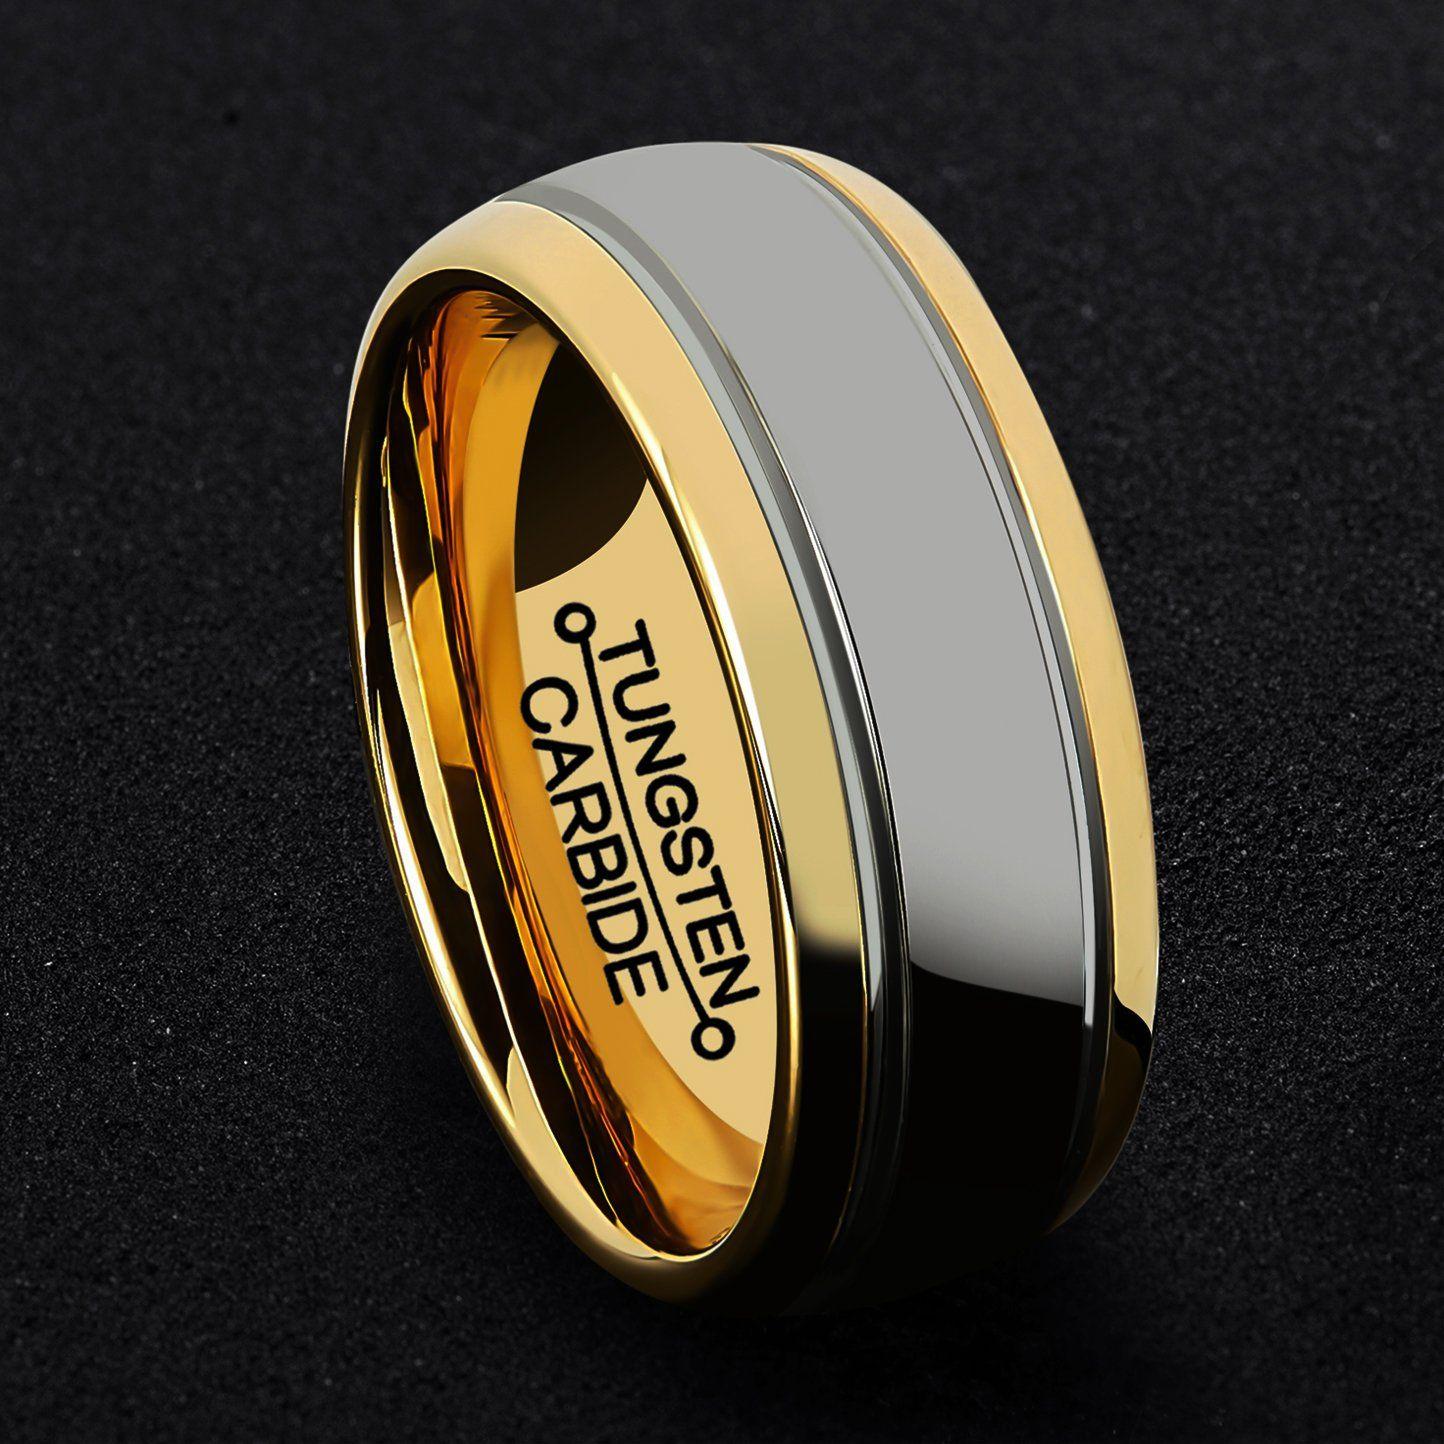 HSG Tungsten Rings for Men 18k Gold Plated Wedding Ring